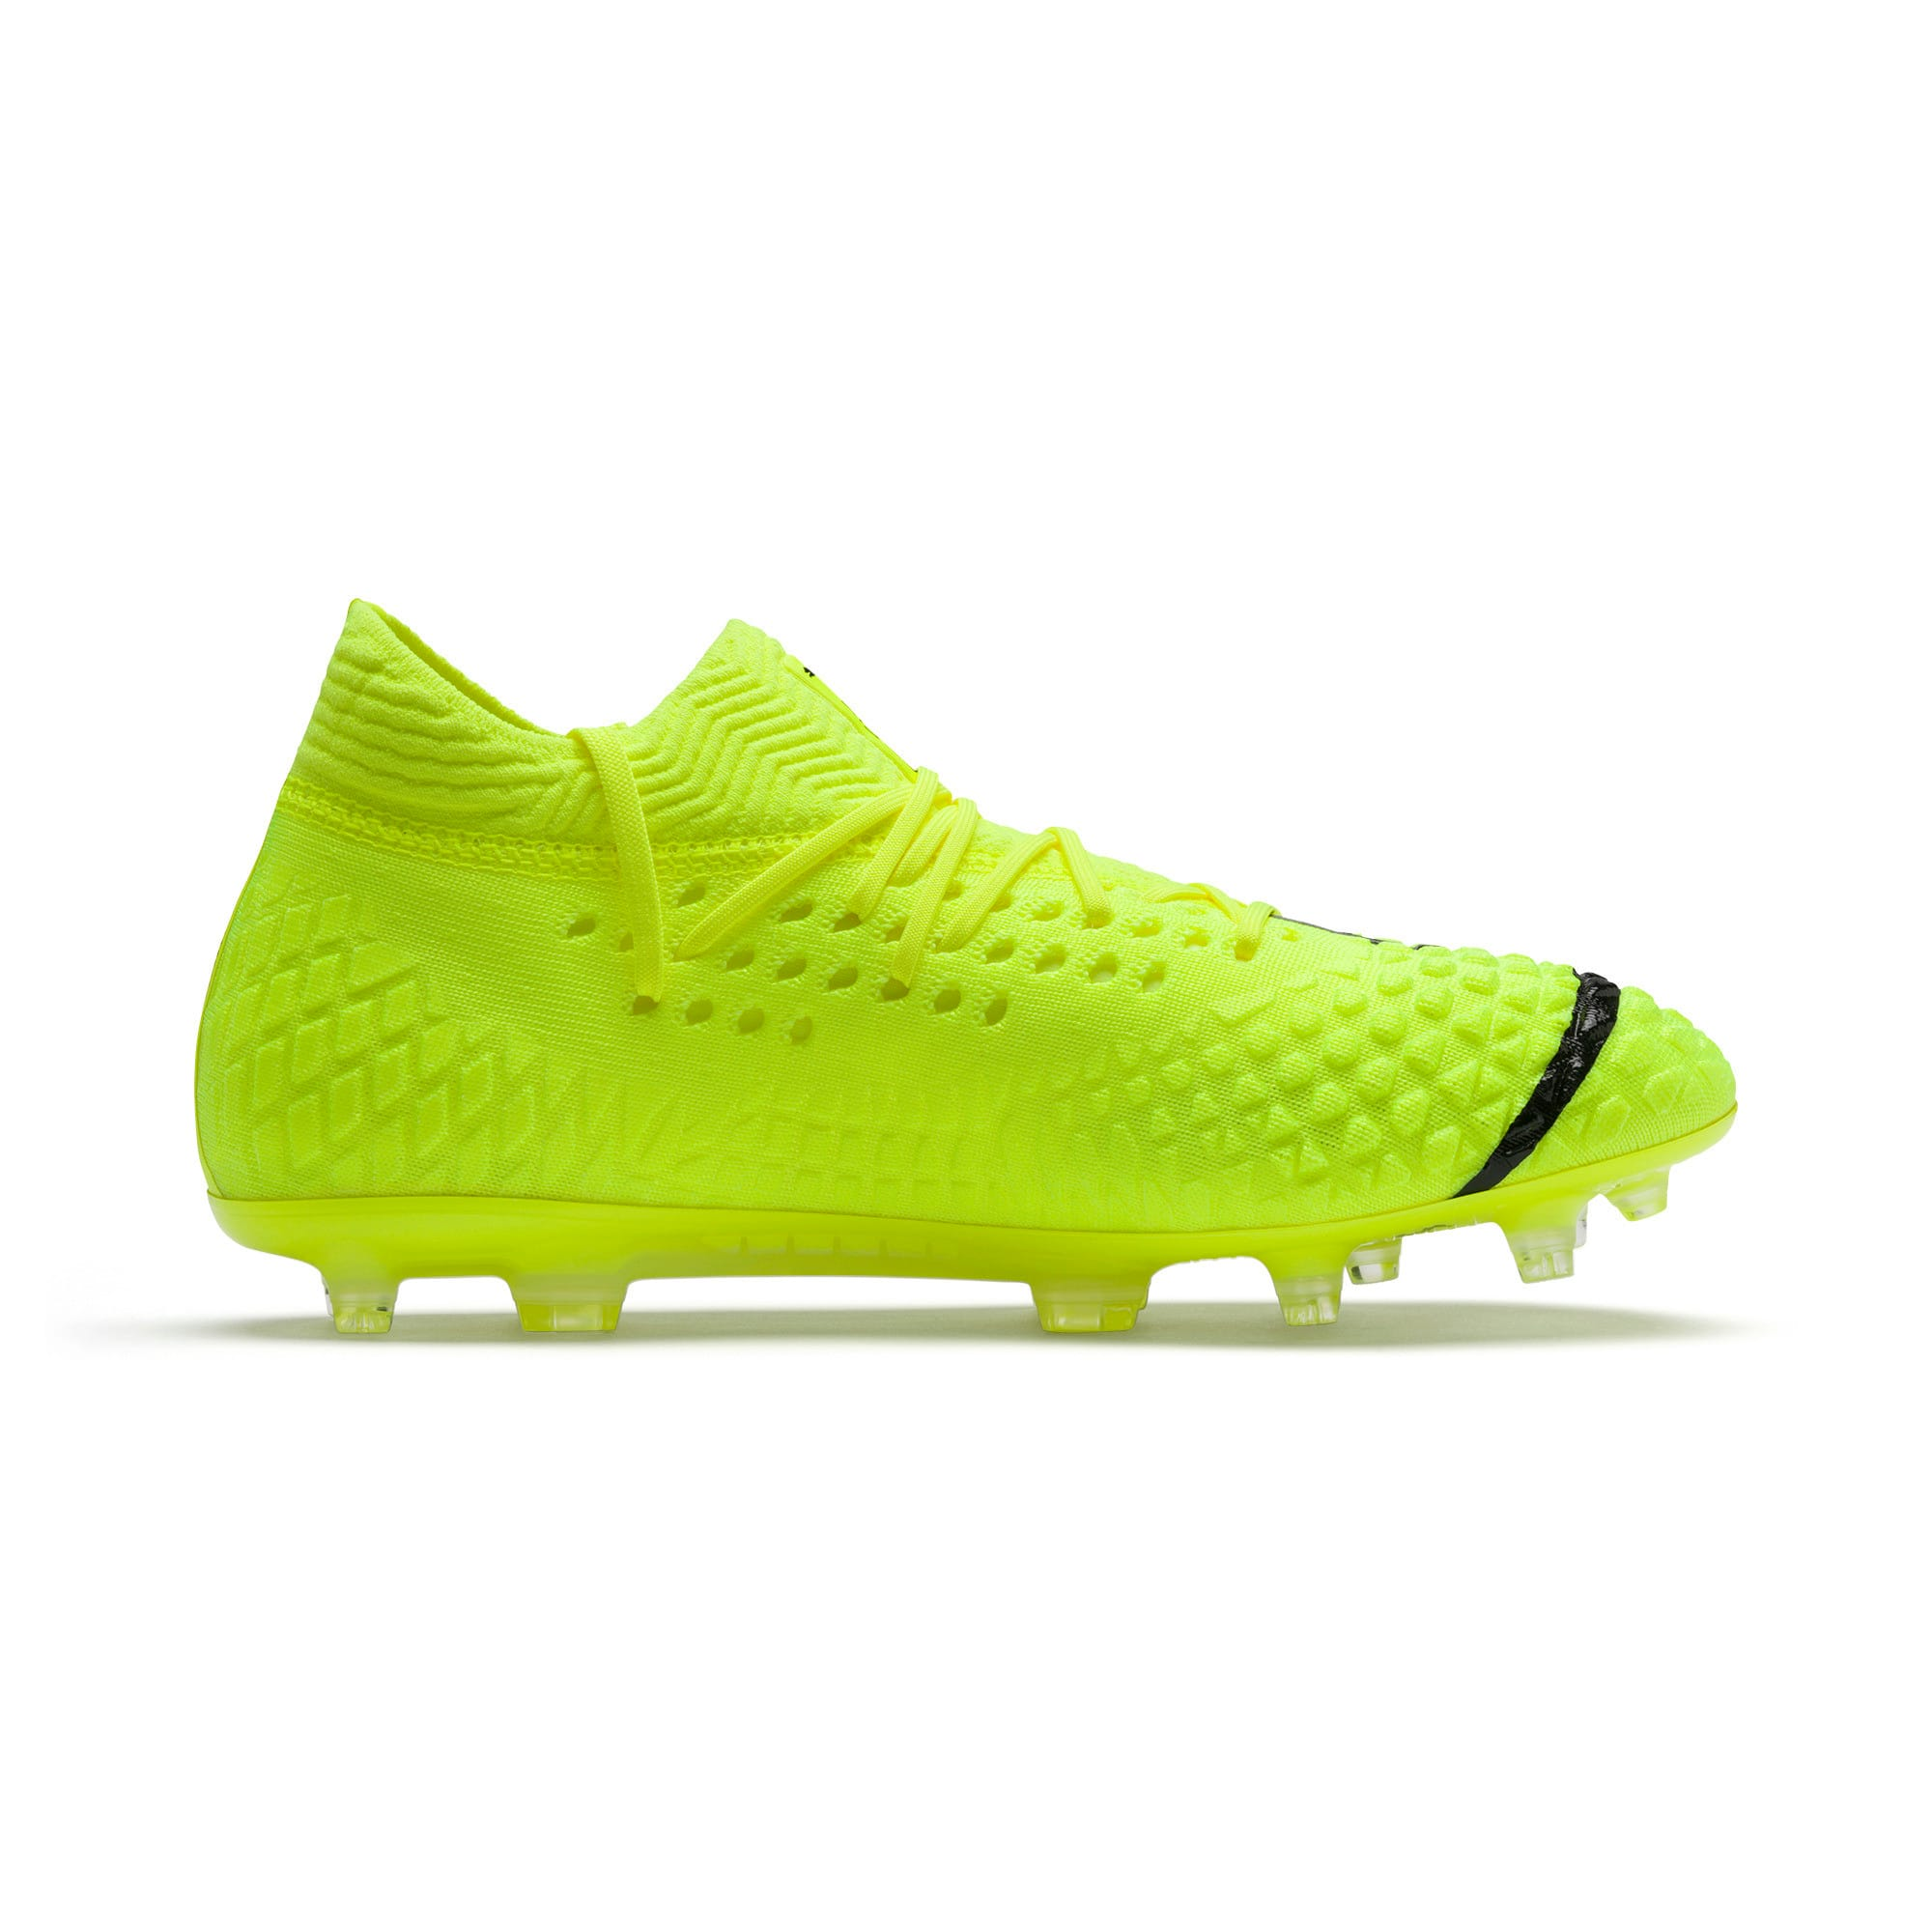 Thumbnail 5 of FUTURE 4.1 NETFIT Griezmann FG/AG Men's Football Boots, Yellow Alert-Puma Black, medium